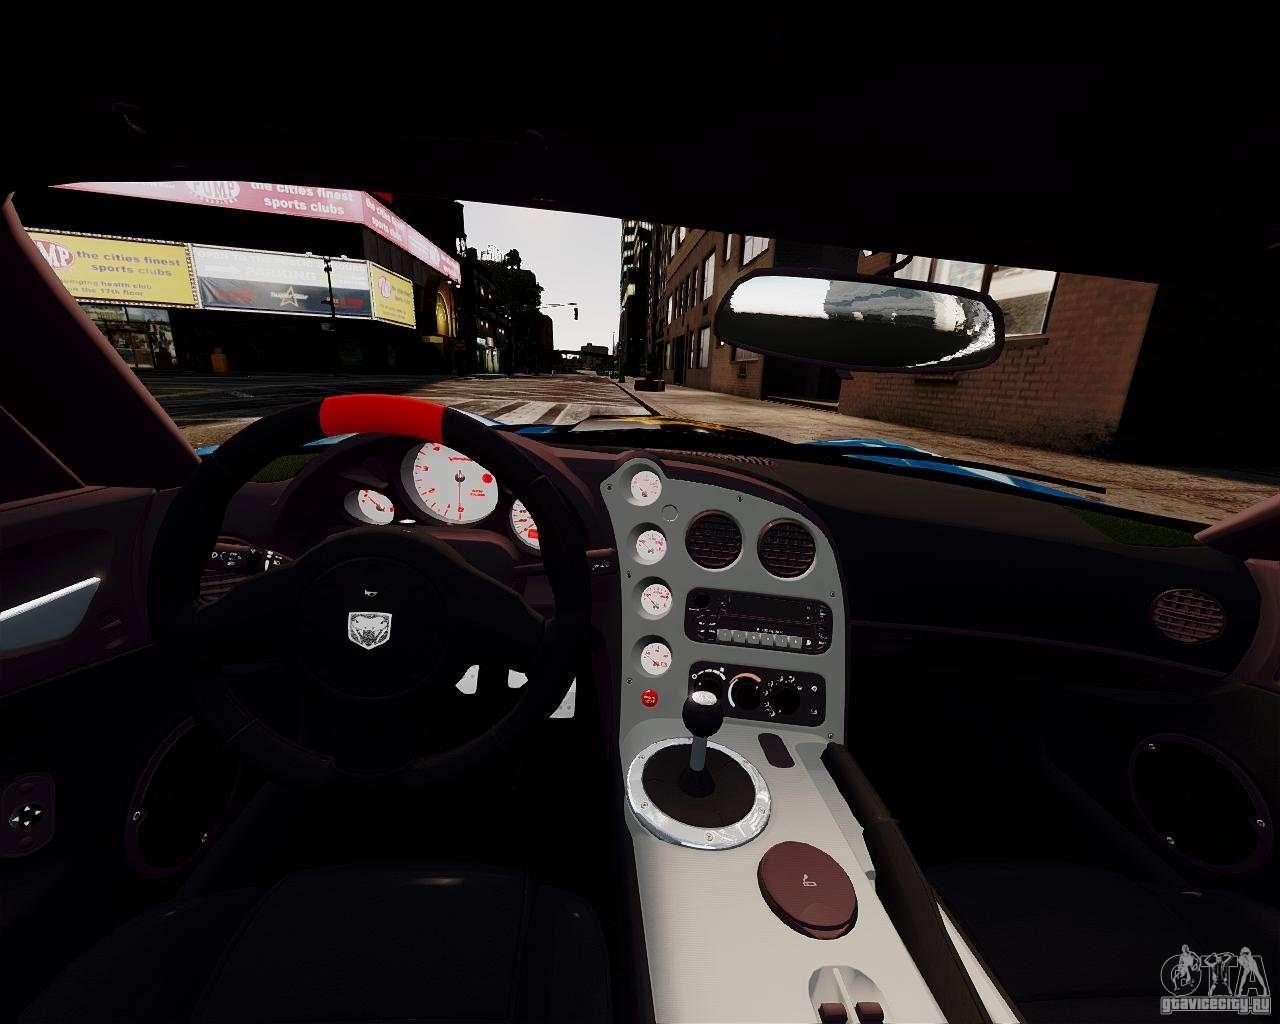 Test Drive Unlimited  Dodge Viper Police Car